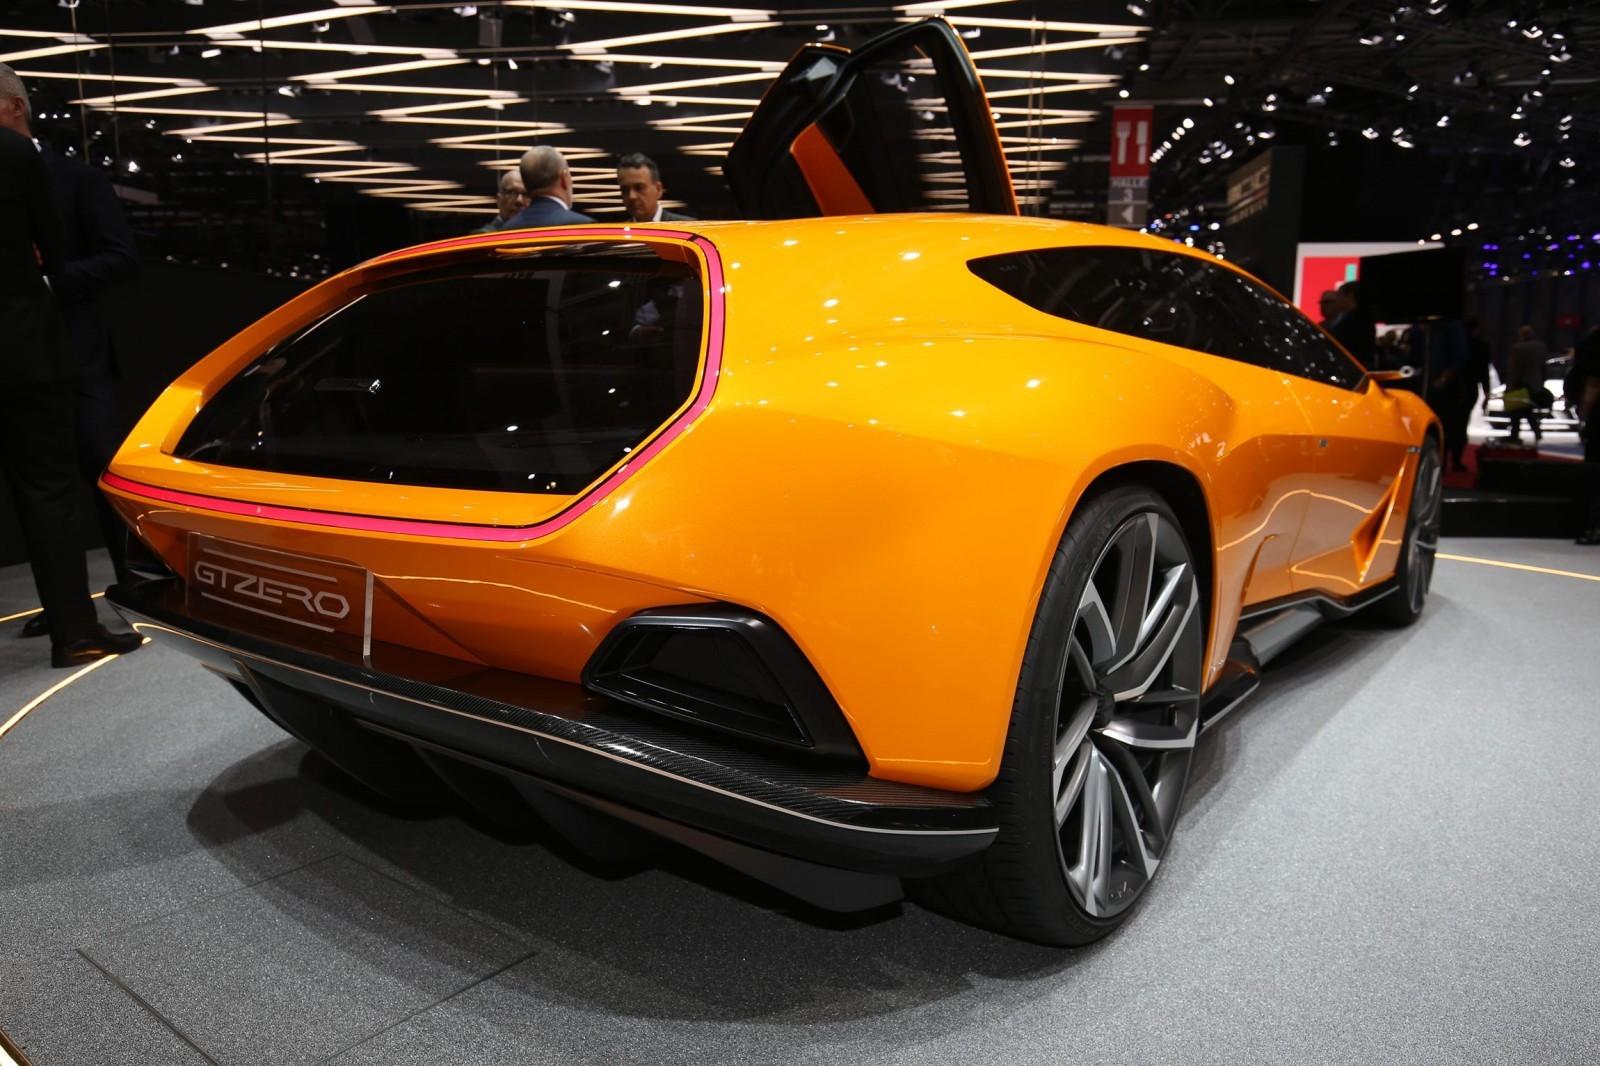 2016 Italdesign Giugiaro Gtzero 187 Car Revs Daily Com